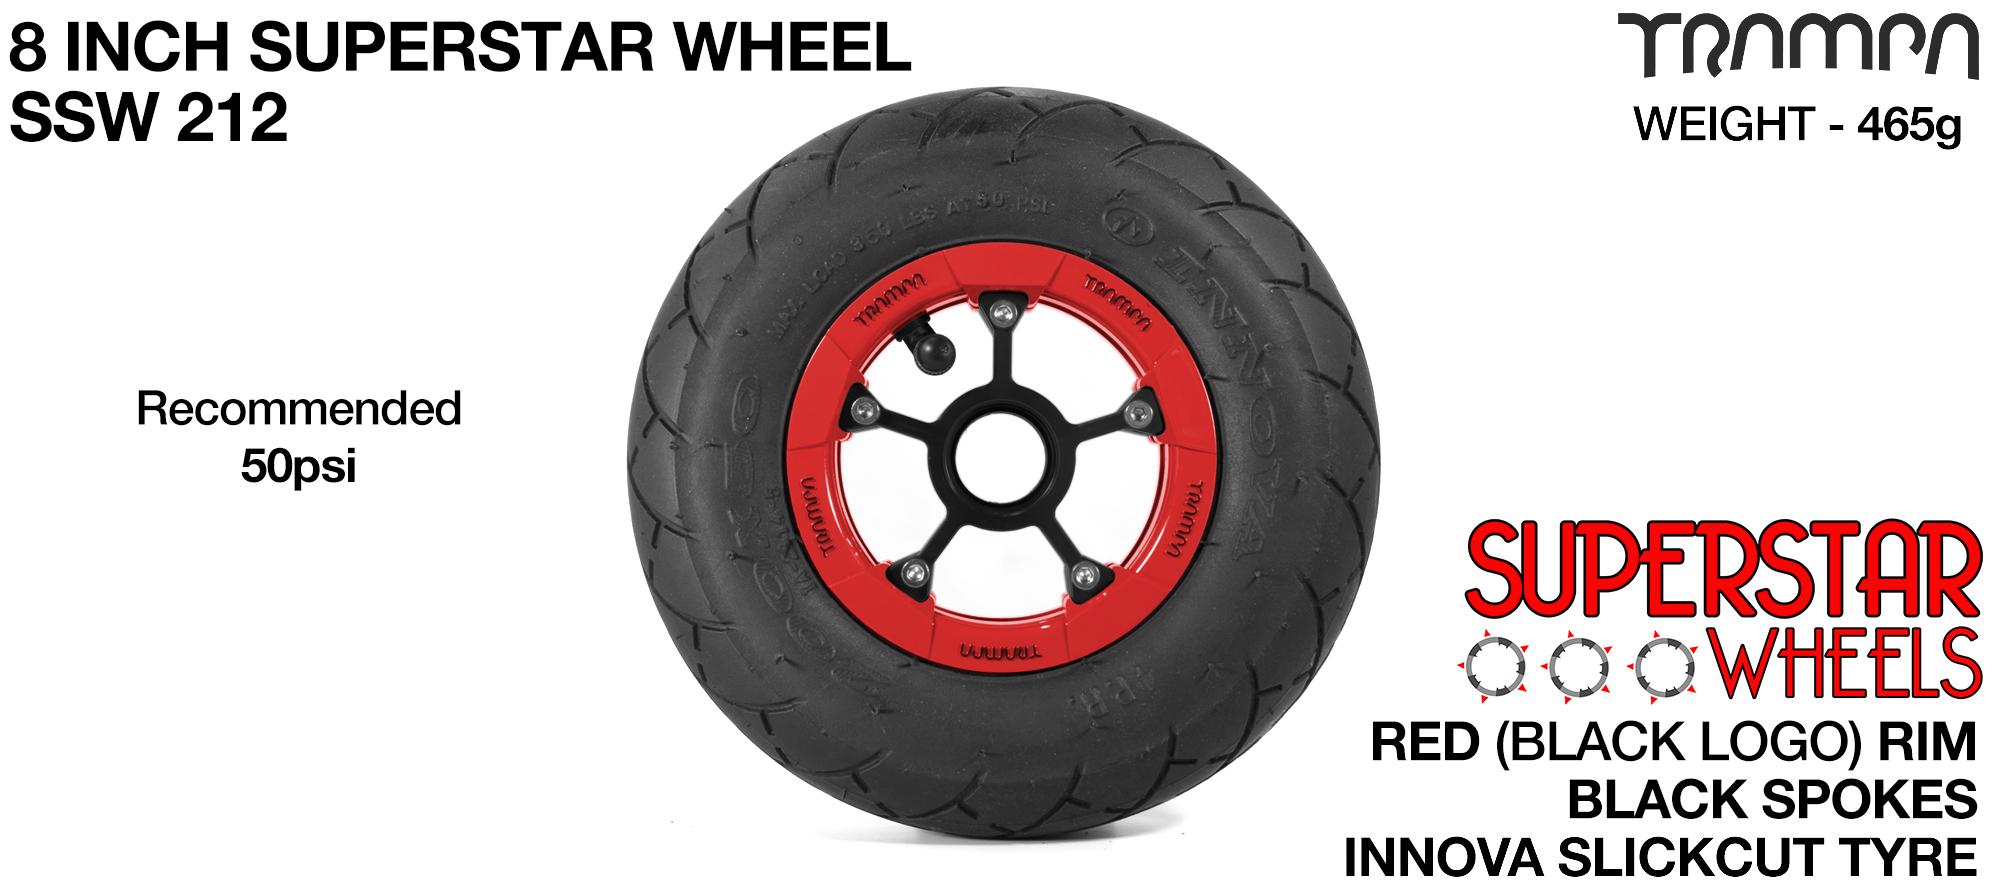 Superstar 8 inch wheels - Red Gloss Black Logo Superstar Rim with Black Anodised spokes & BLACK SLICKCUT 8 inch Tyre